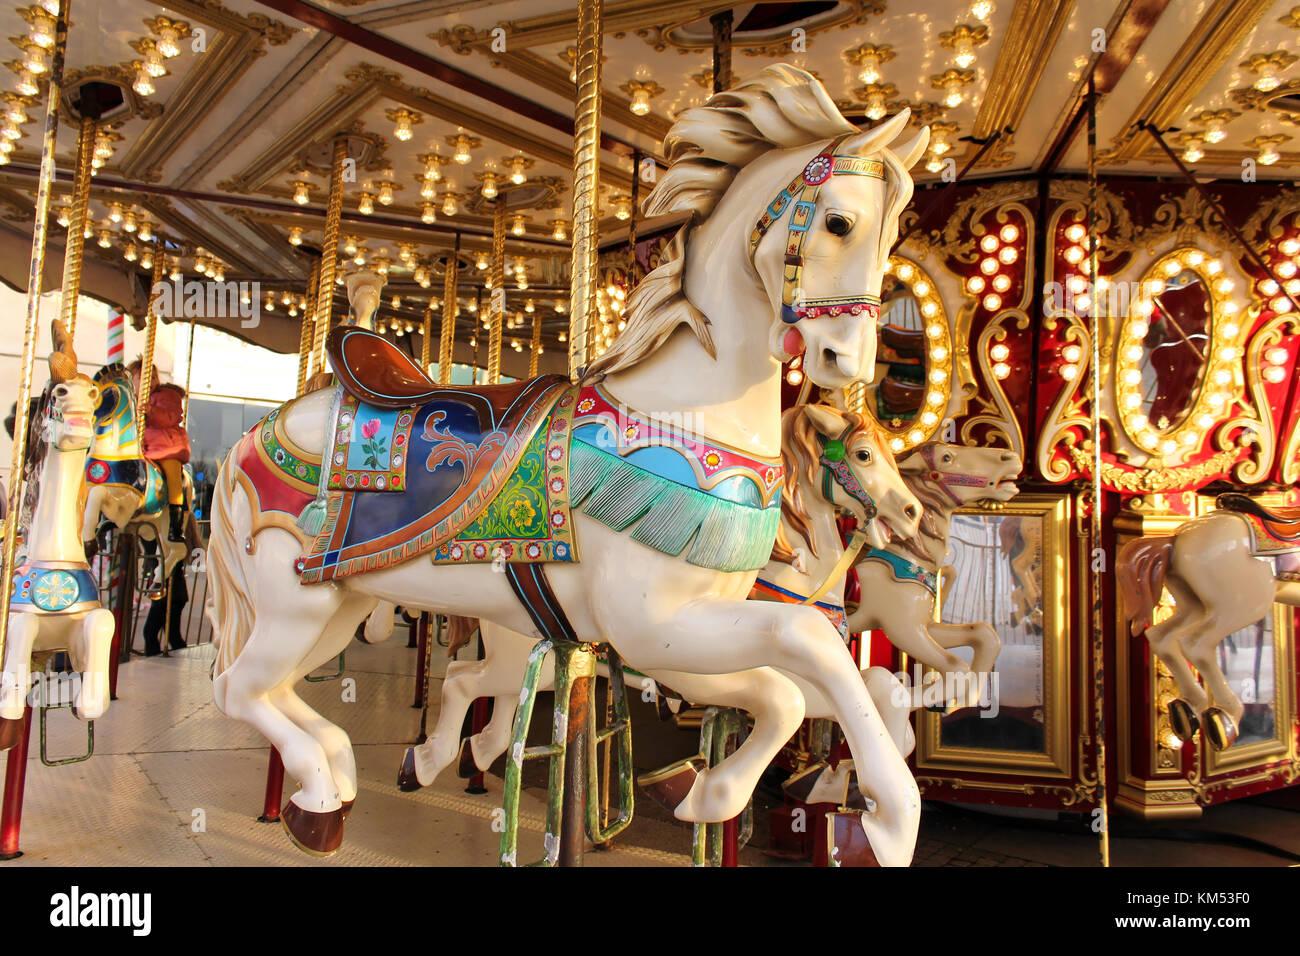 Vintage Carousel Kids Stock Photos & Vintage Carousel Kids ...